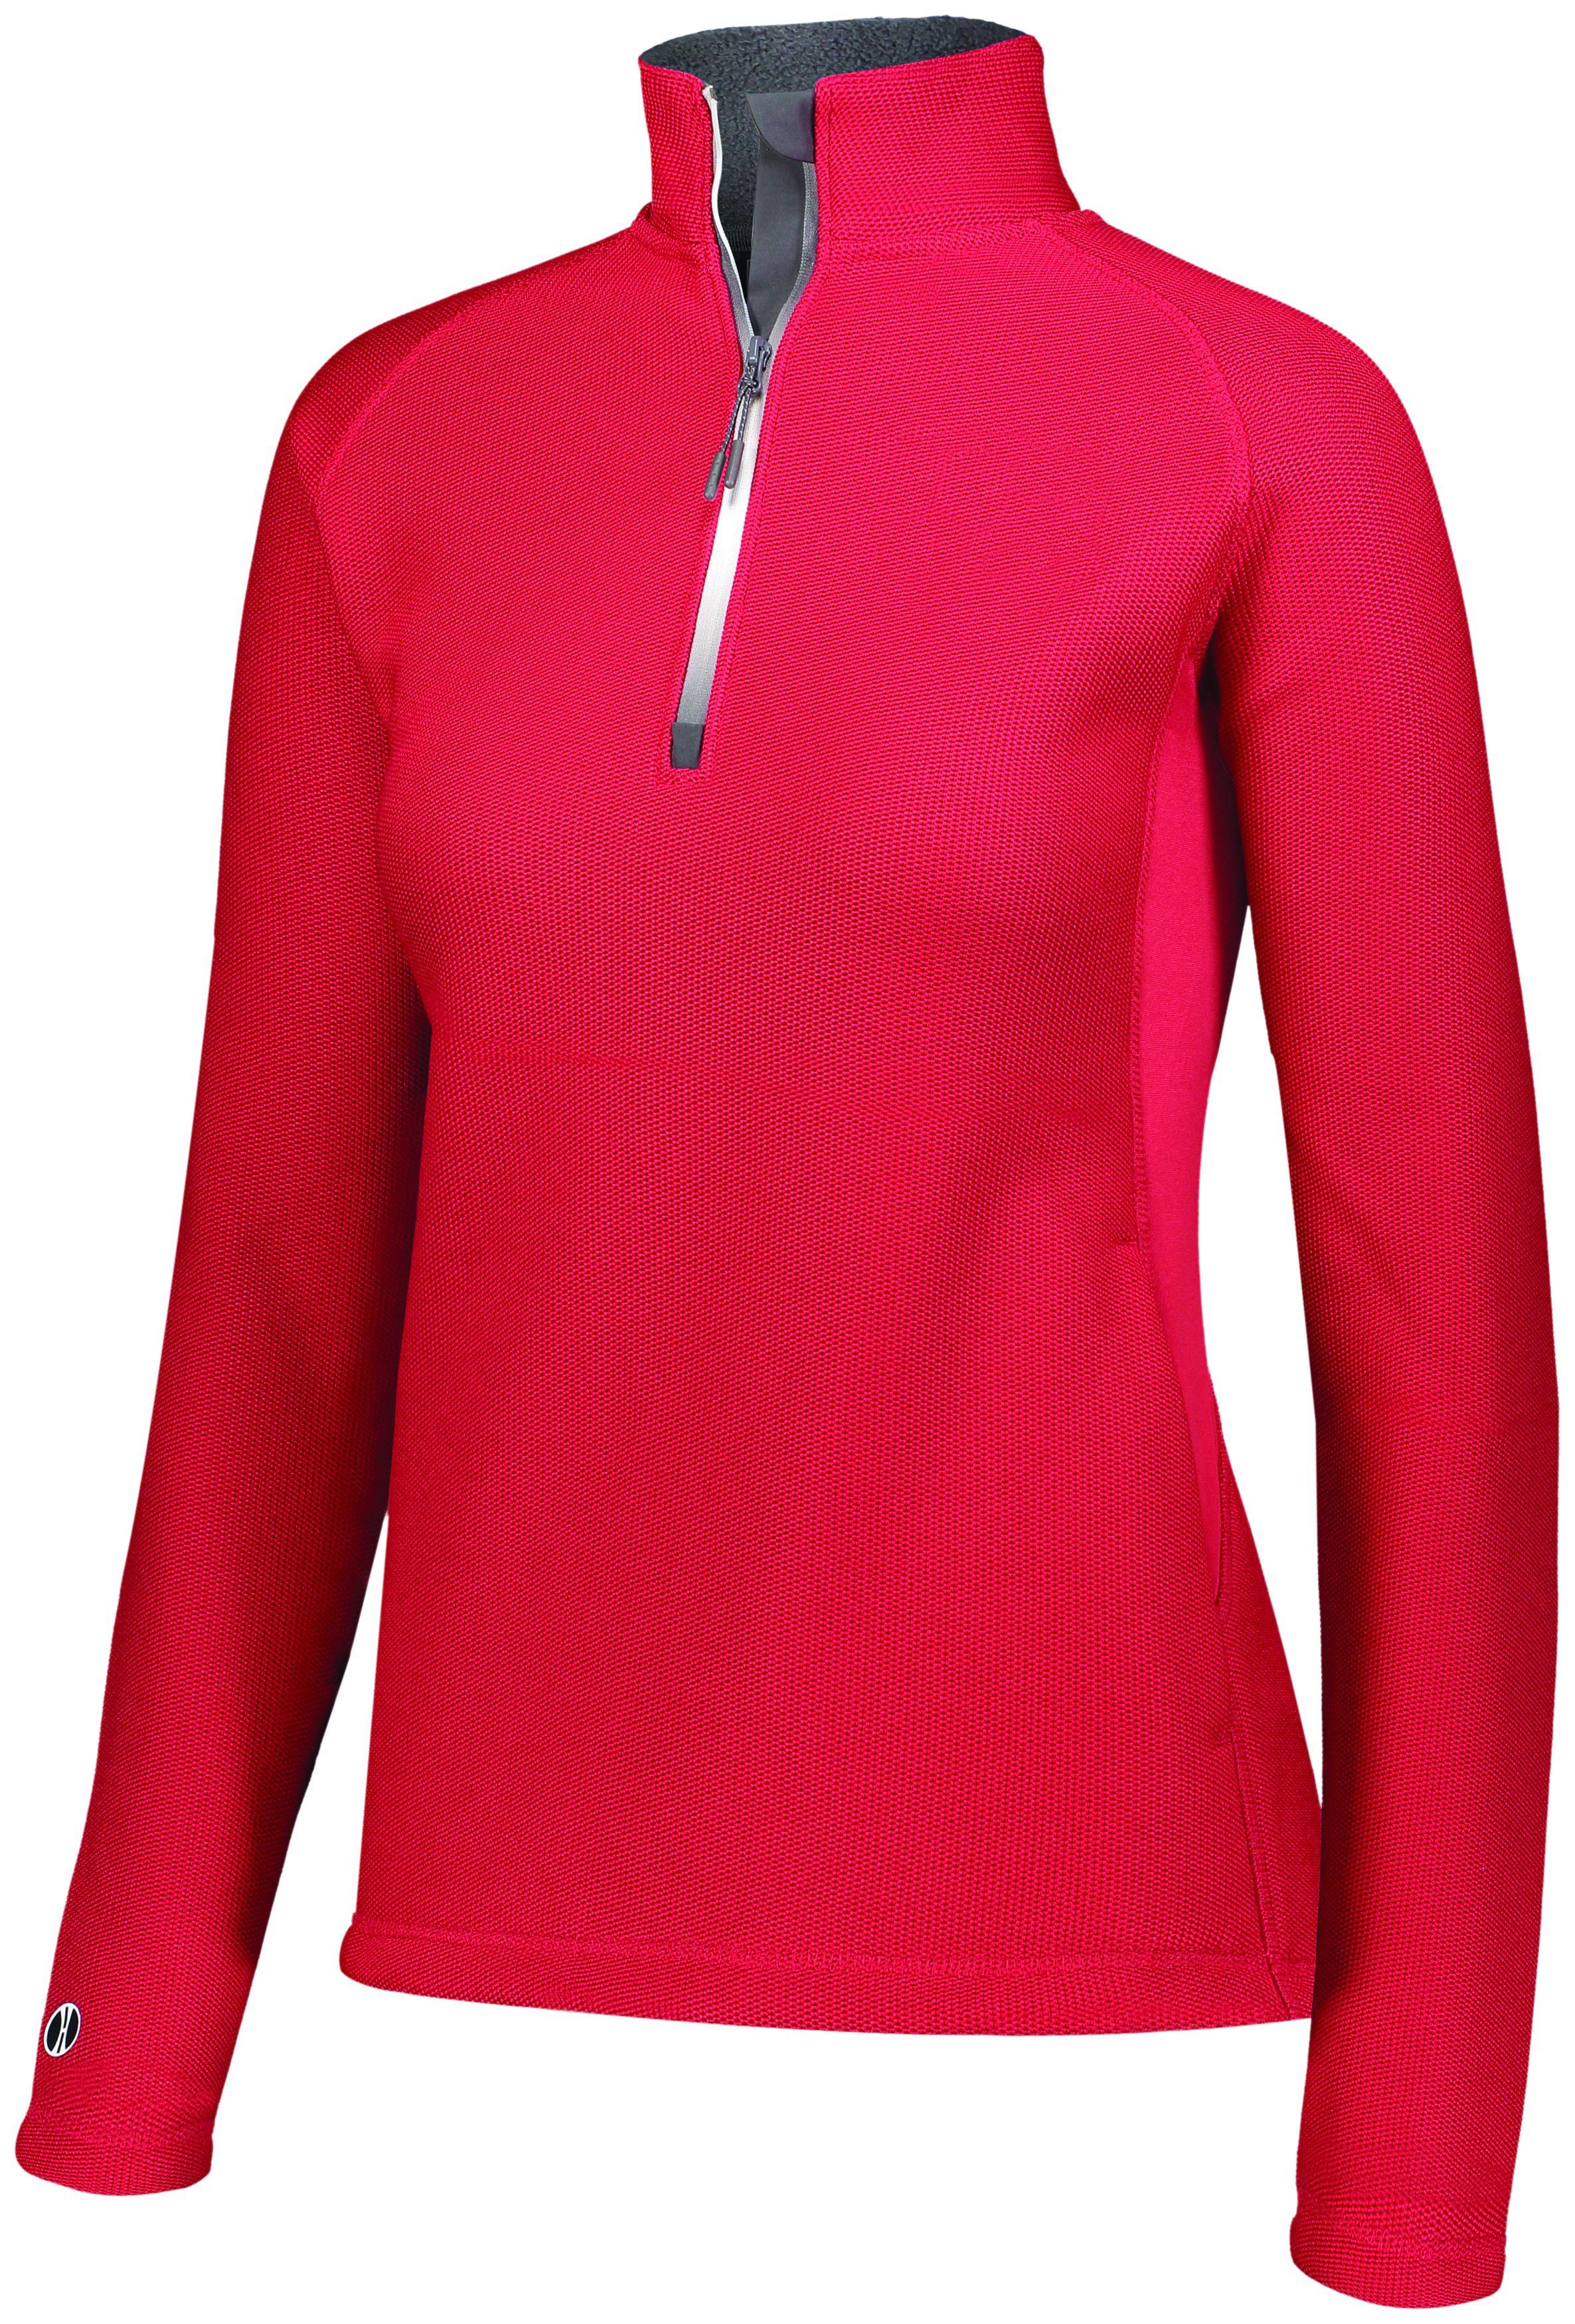 Ladies Invert 1/2 Zip Pullover - SCARLET